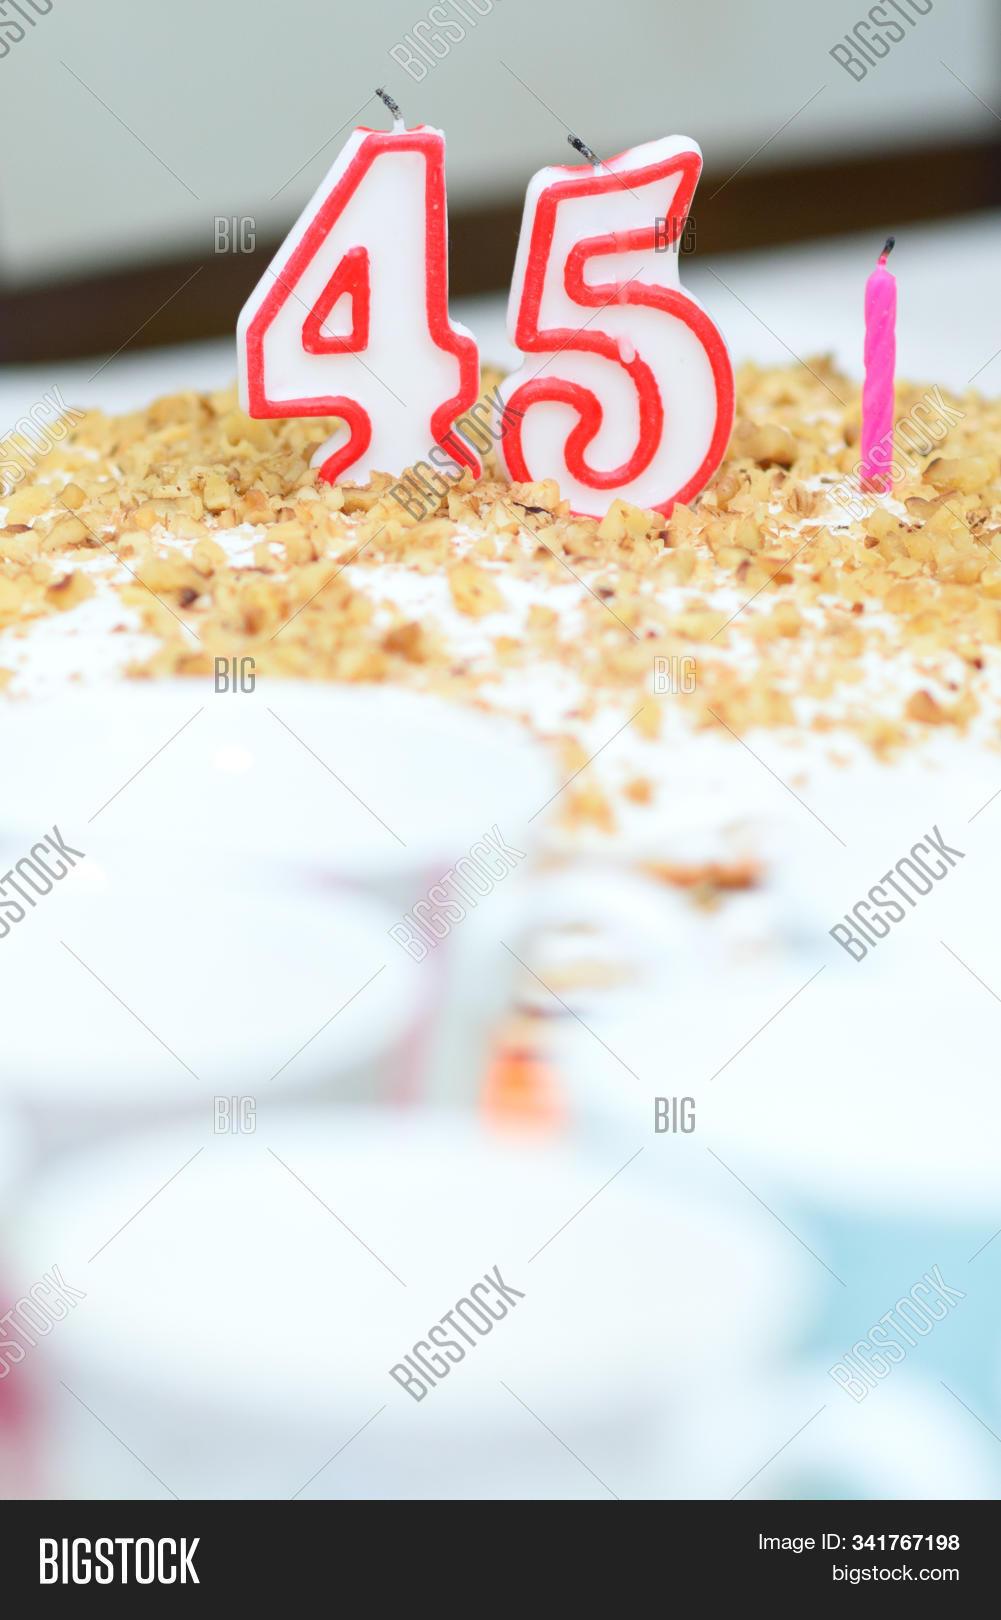 Astounding Real Birthday Cake Image Photo Free Trial Bigstock Personalised Birthday Cards Paralily Jamesorg